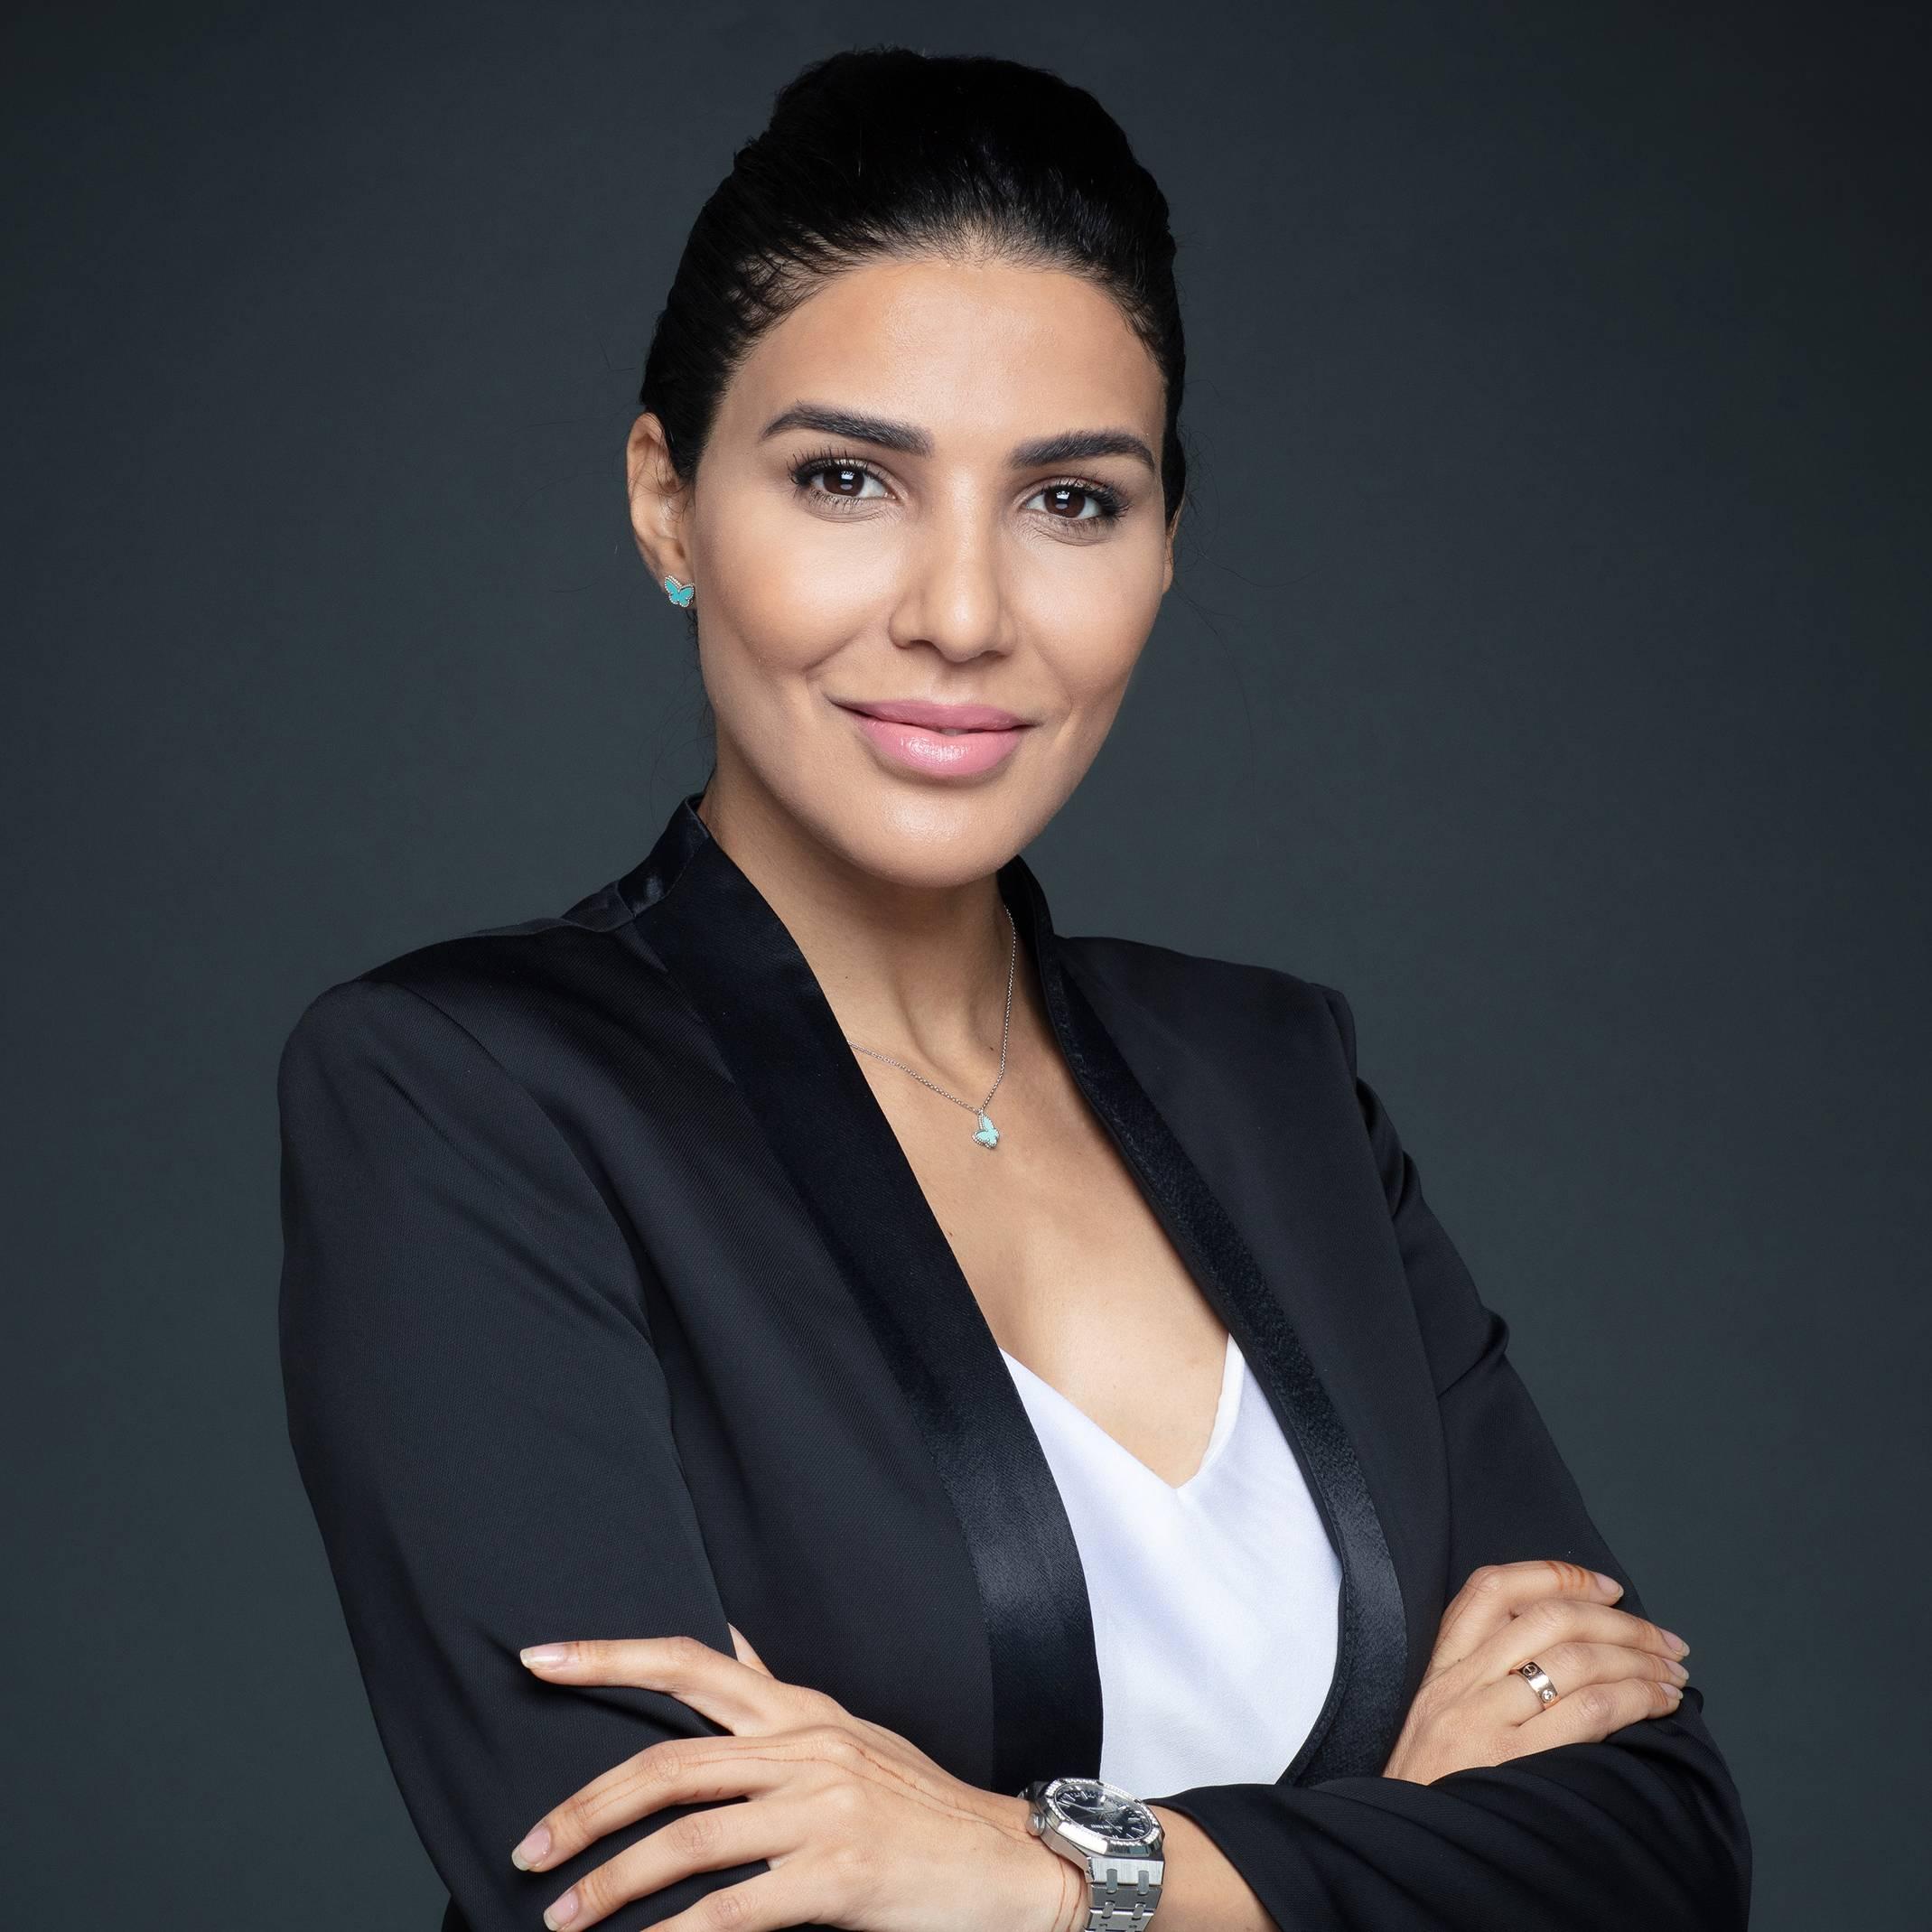 Dalila Laaribi